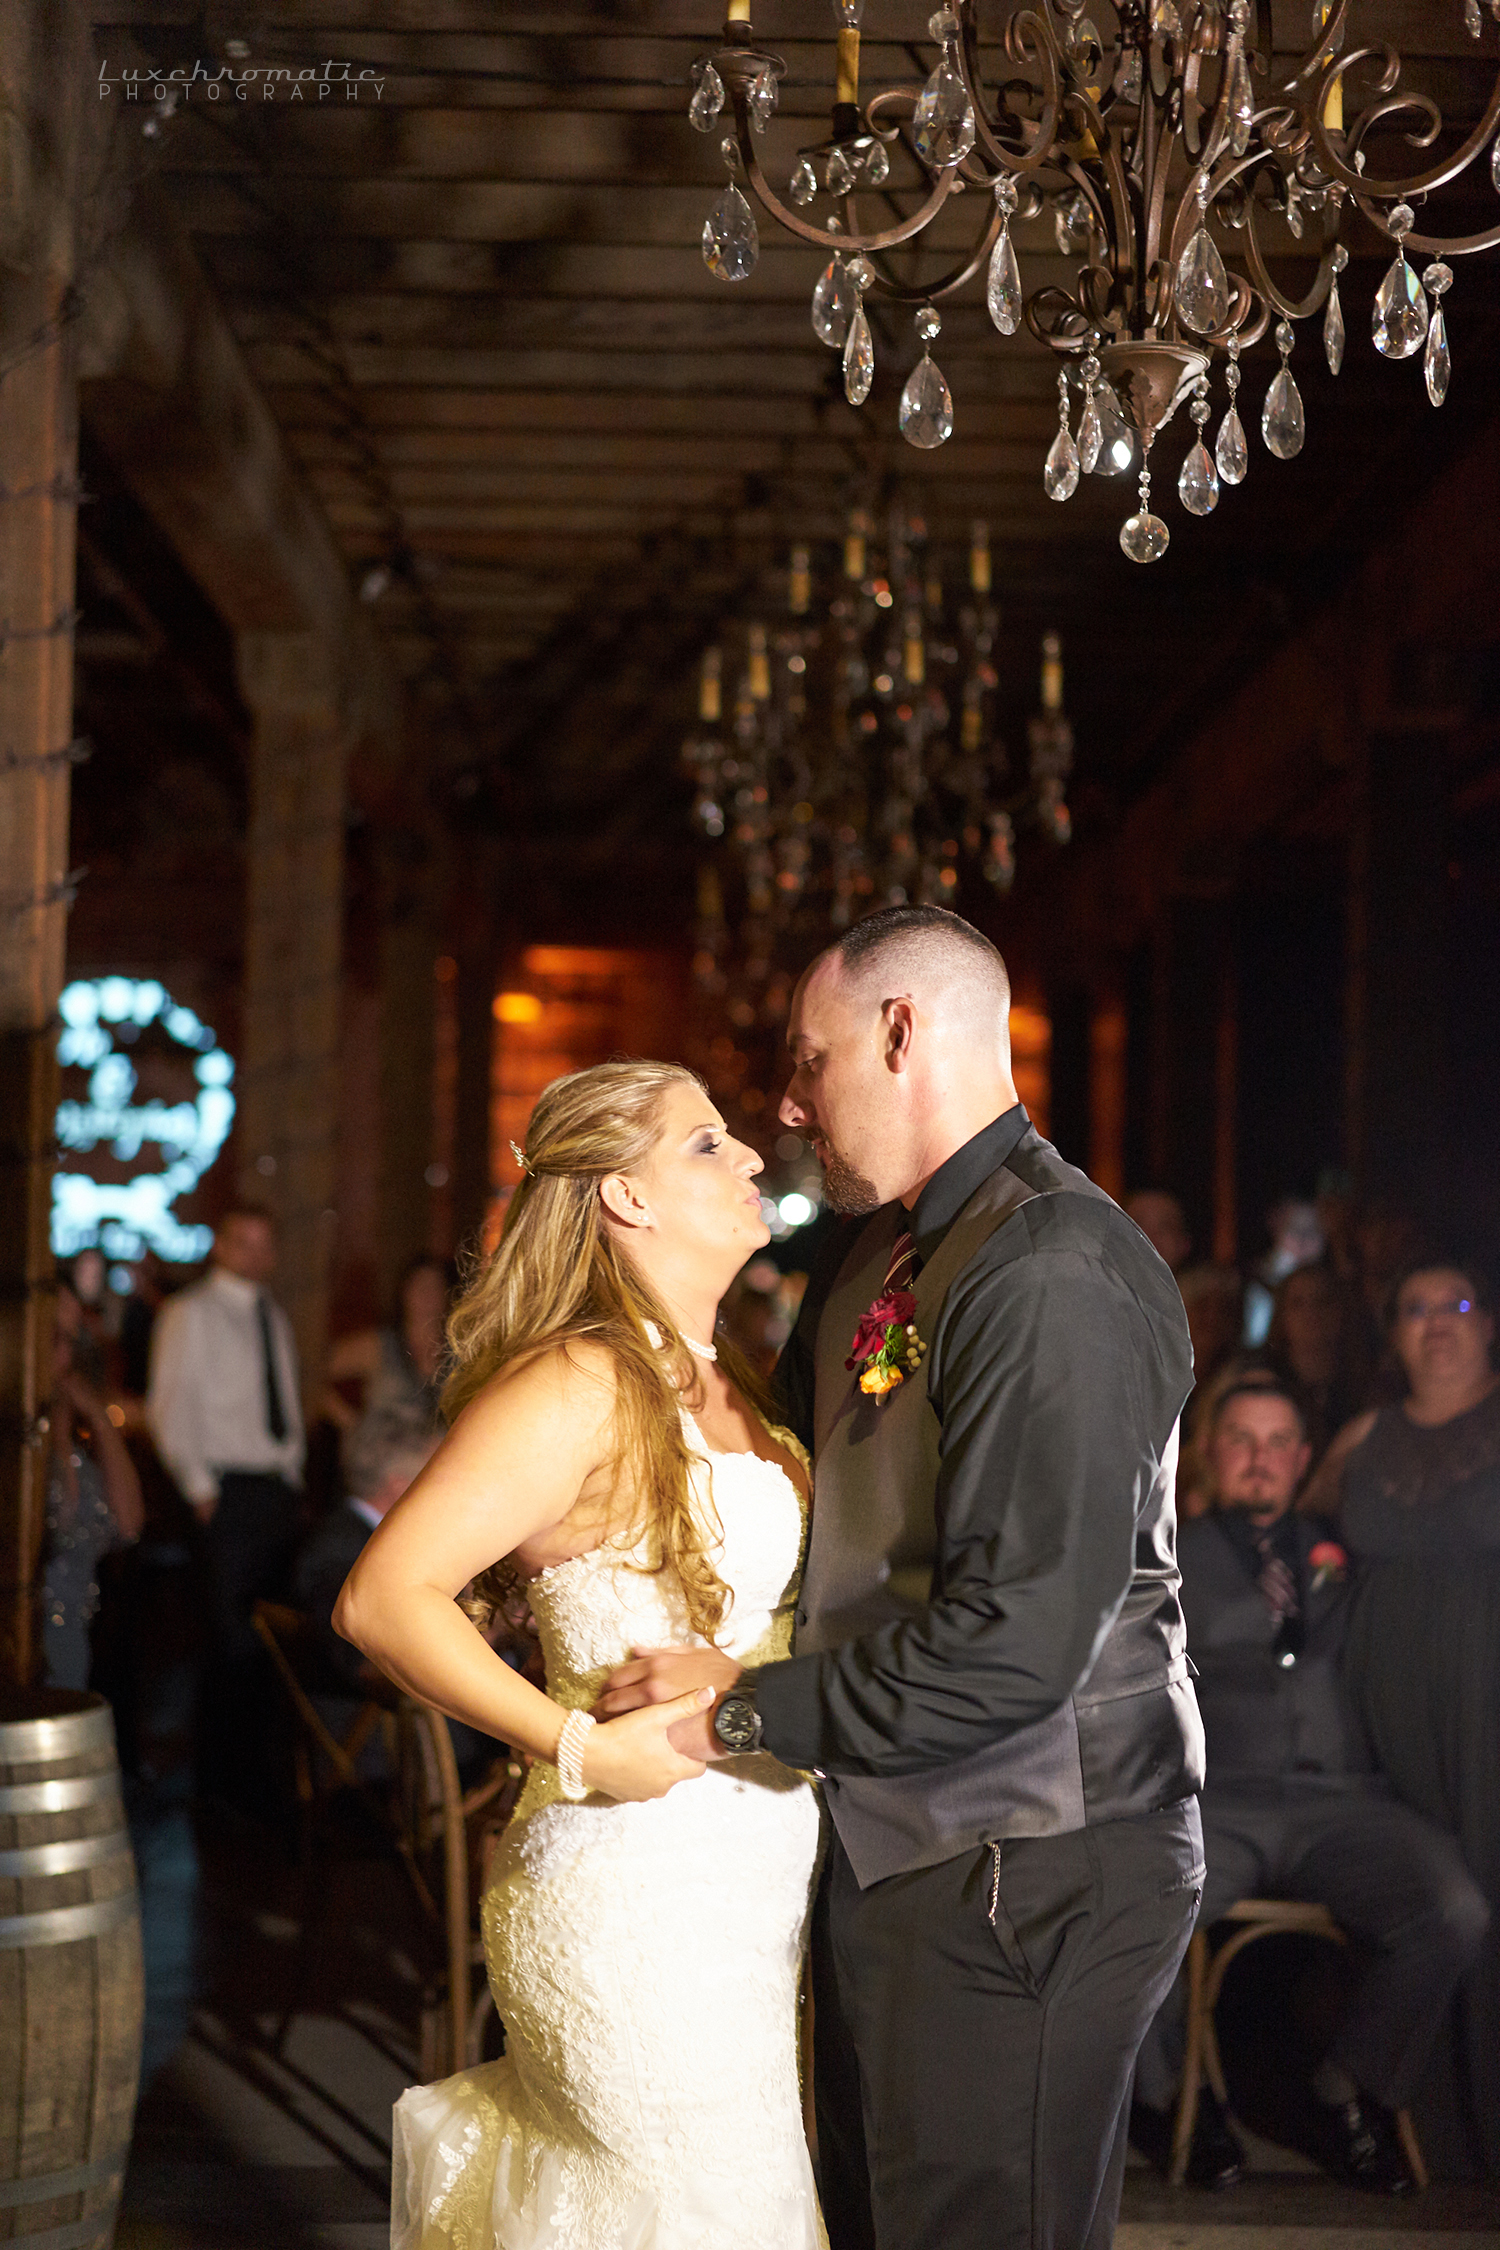 081217_Rachel_Chris_a1041-weddingdress-bride-weddingphotography-weddingphotographer-bridal-groom-wedding-engagementring-proposal-brides-diamondring-sonyalpha-sony-sonya9-sonya7rii-sanfrancisco-sf-bayarea-photographer-profoto-murrietas-well.jpg